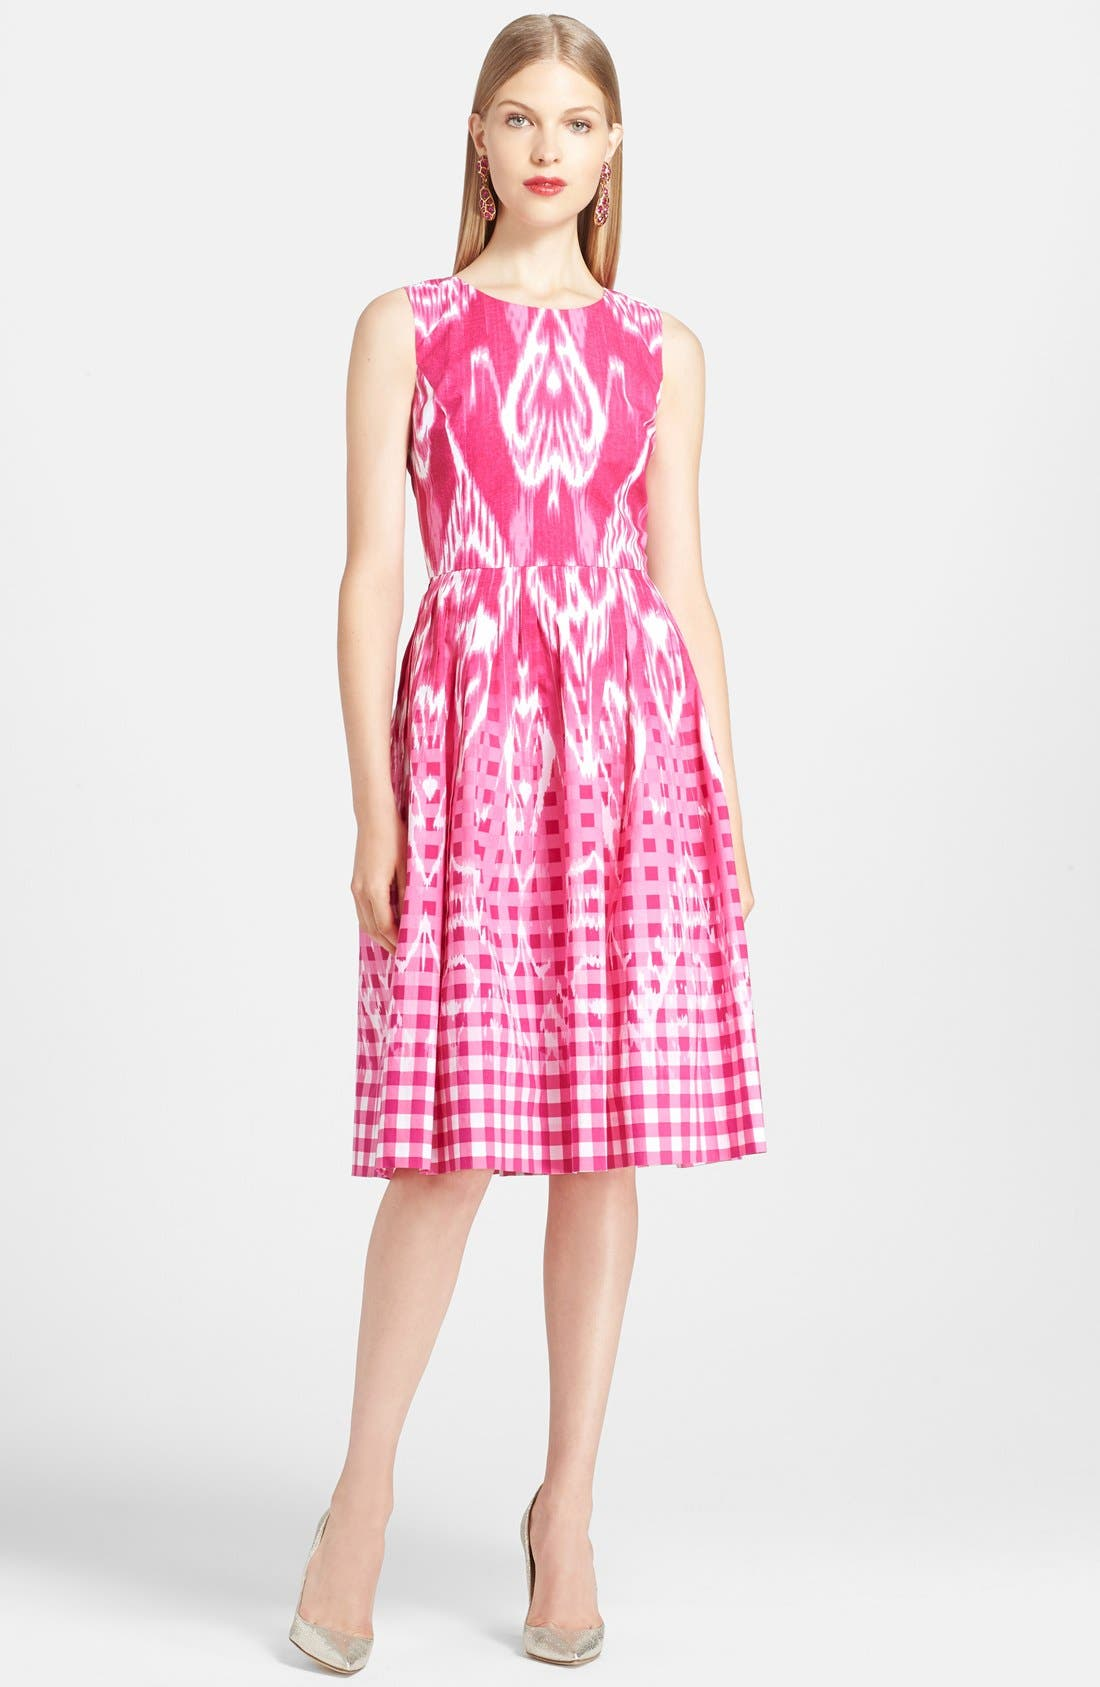 Alternate Image 1 Selected - Oscar de la Renta Ikat Print Poplin Dress